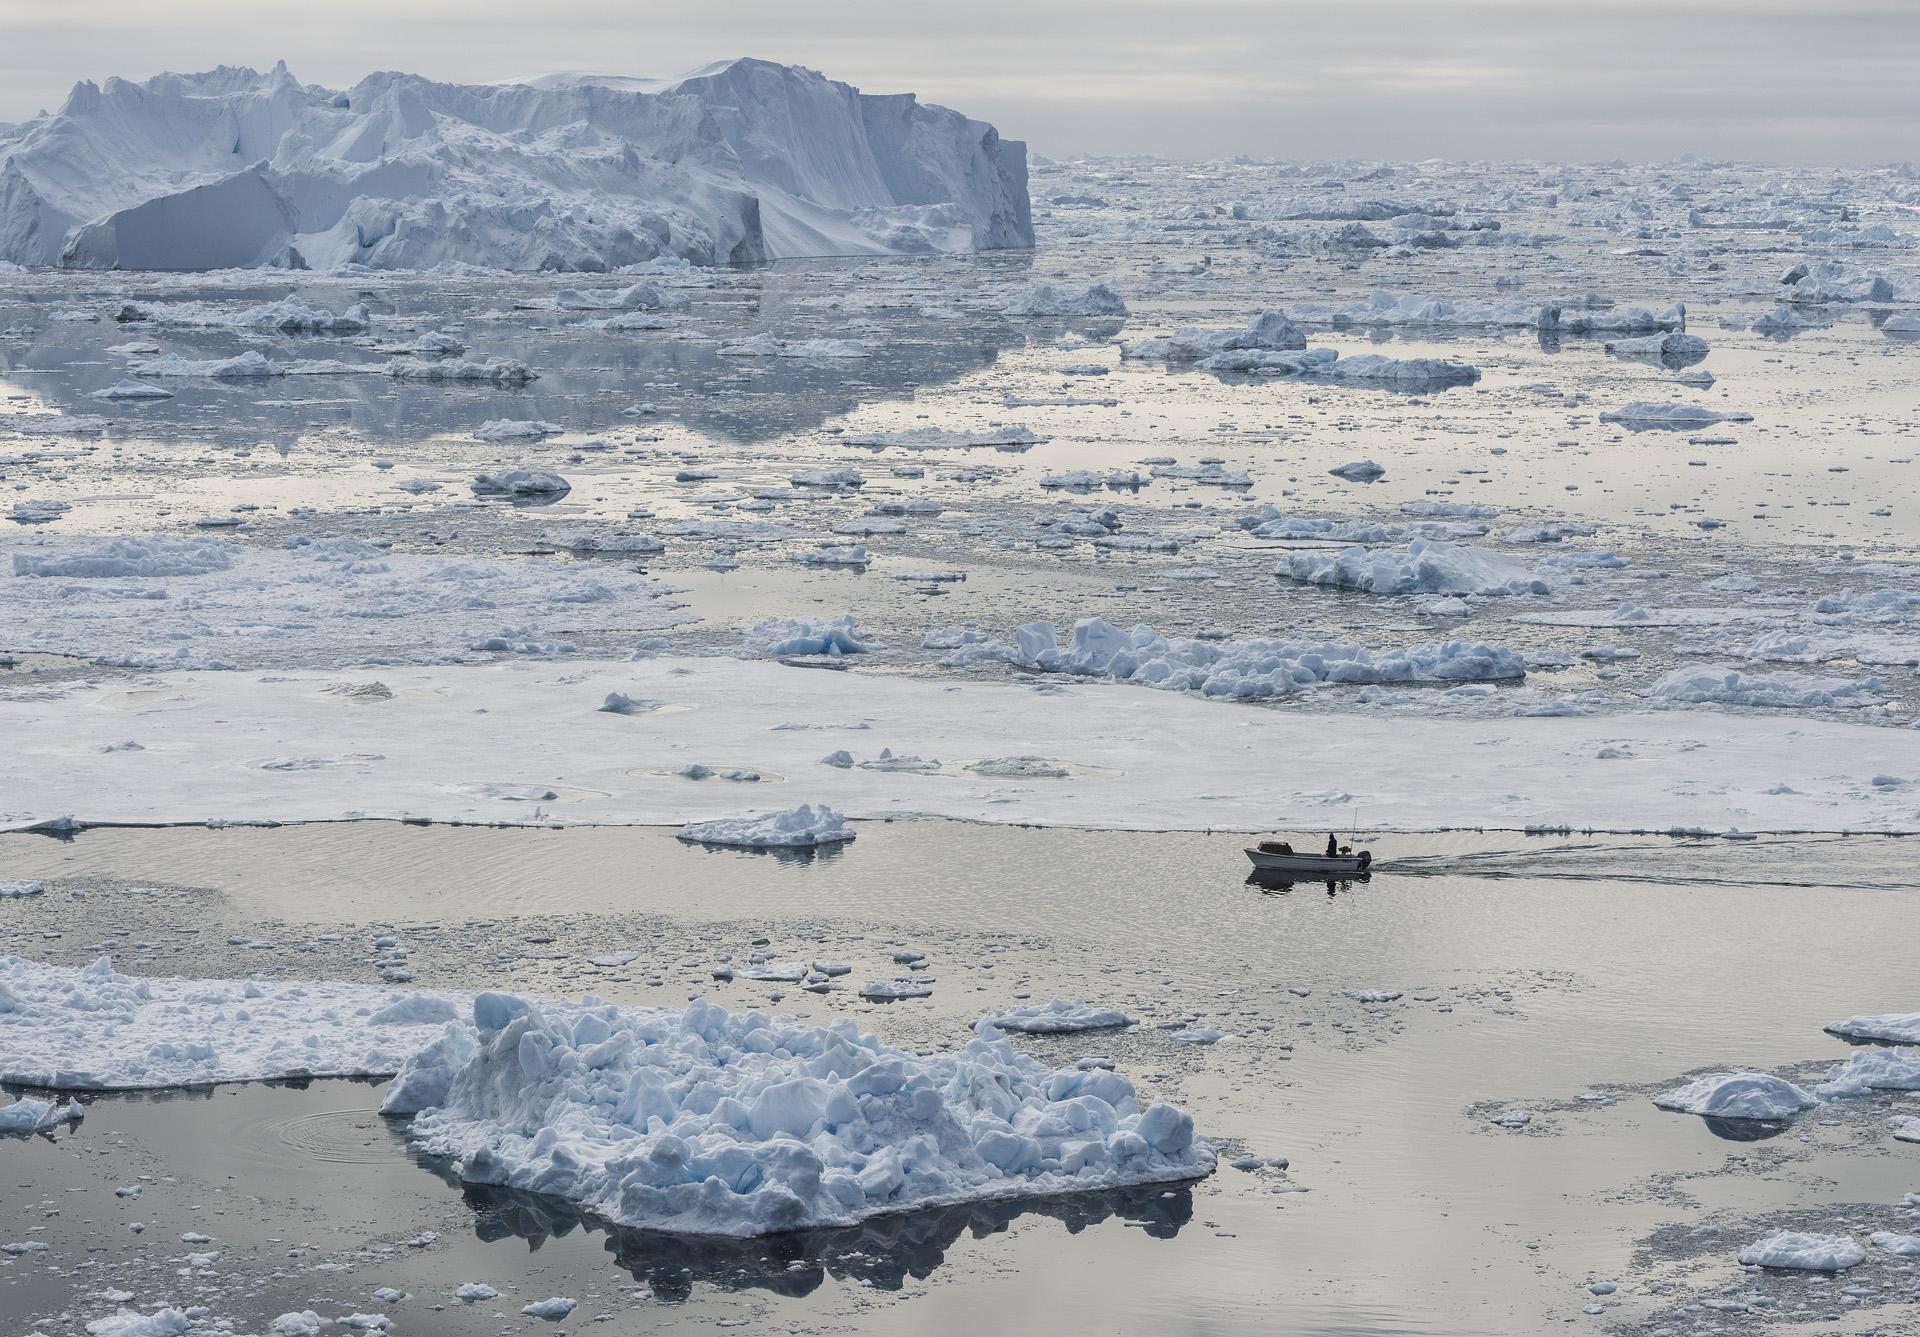 Fisherman & Icebergs, Disko Bay, Greenland 2012